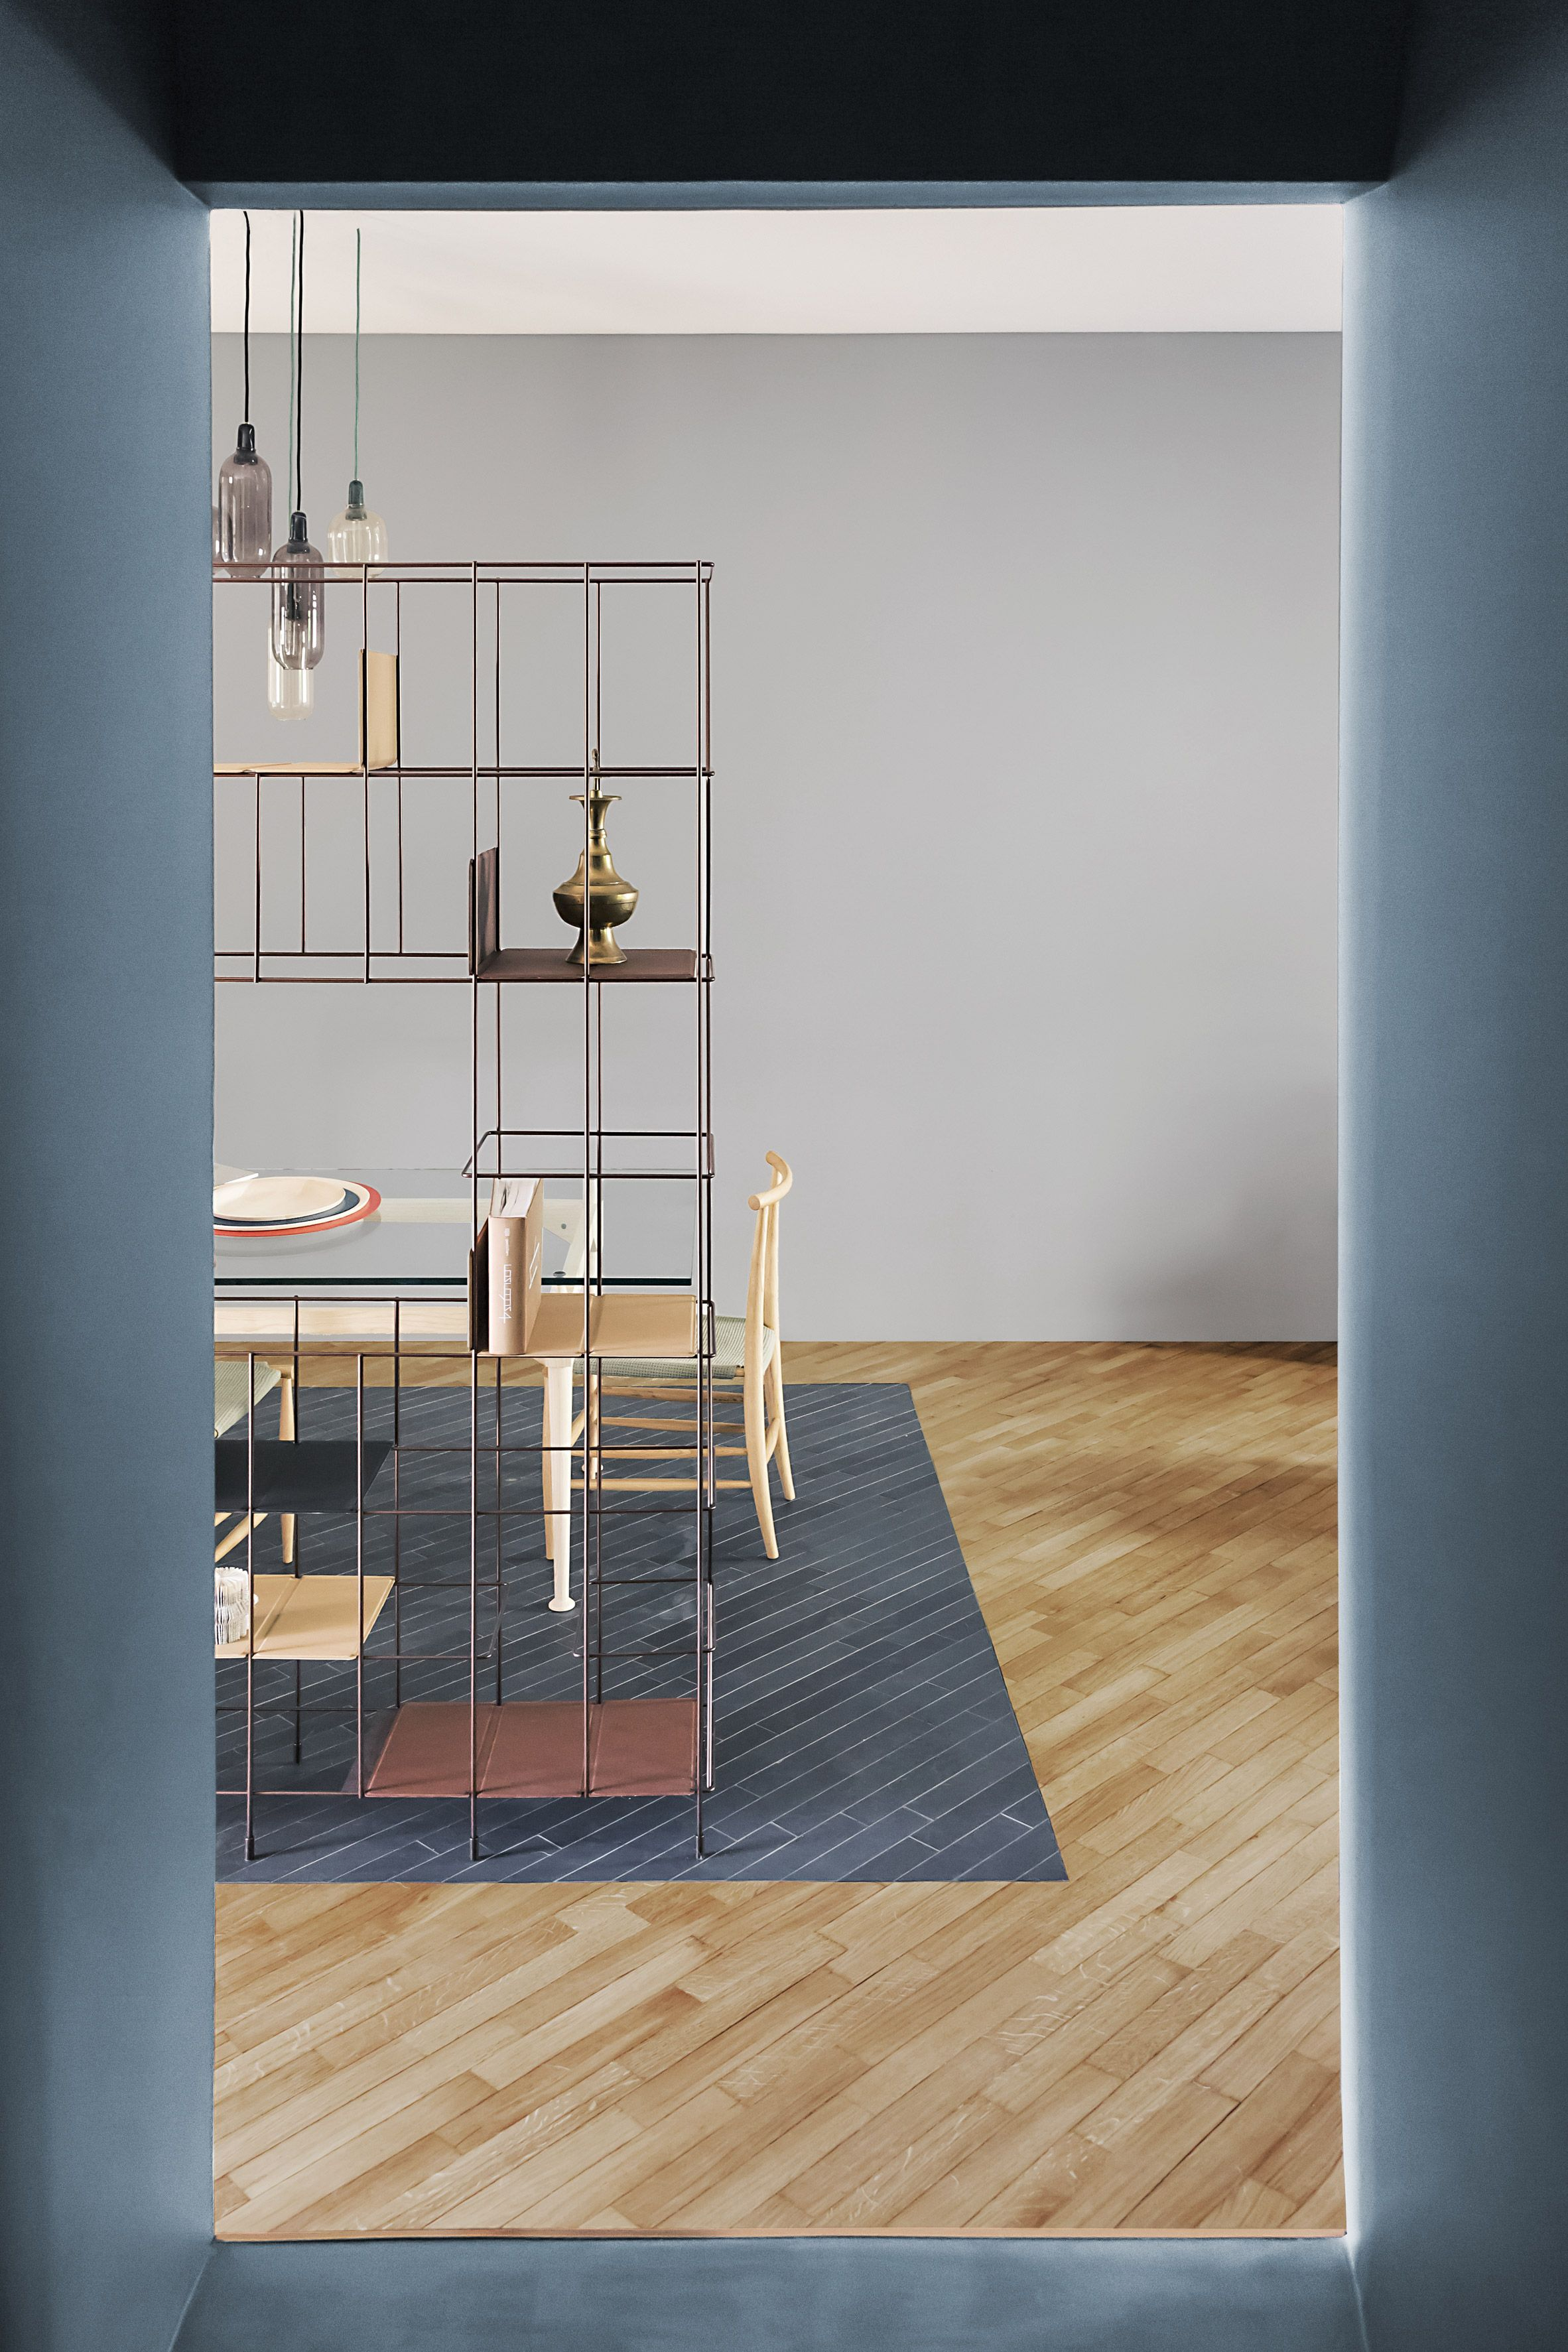 Italian design studio AIM has renovated the interior of a home in